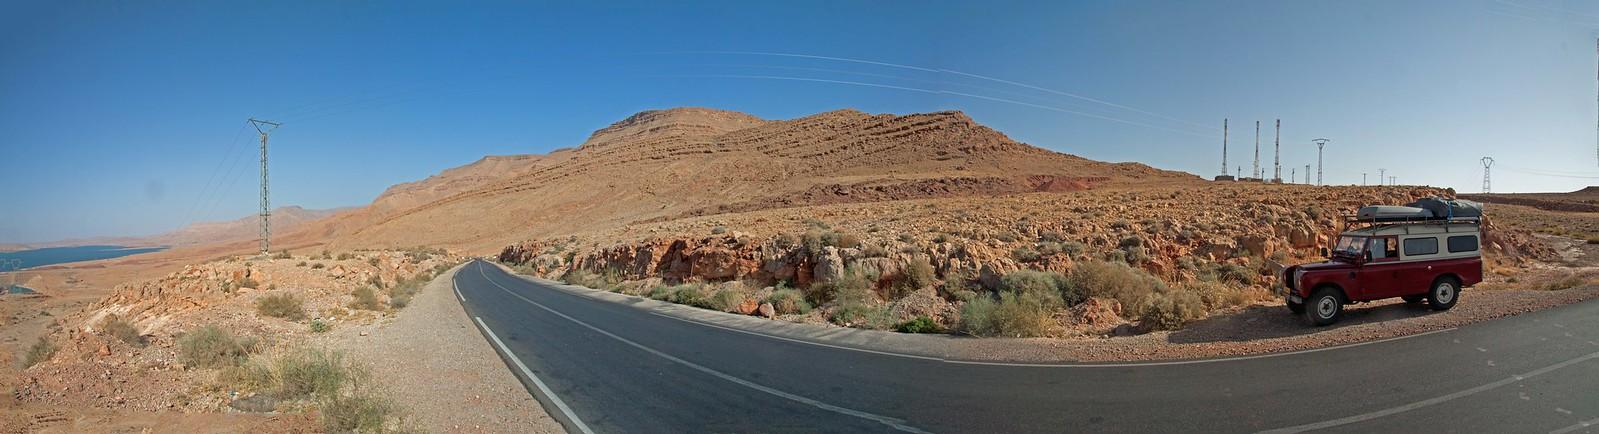 Marokko 2015-07_357p